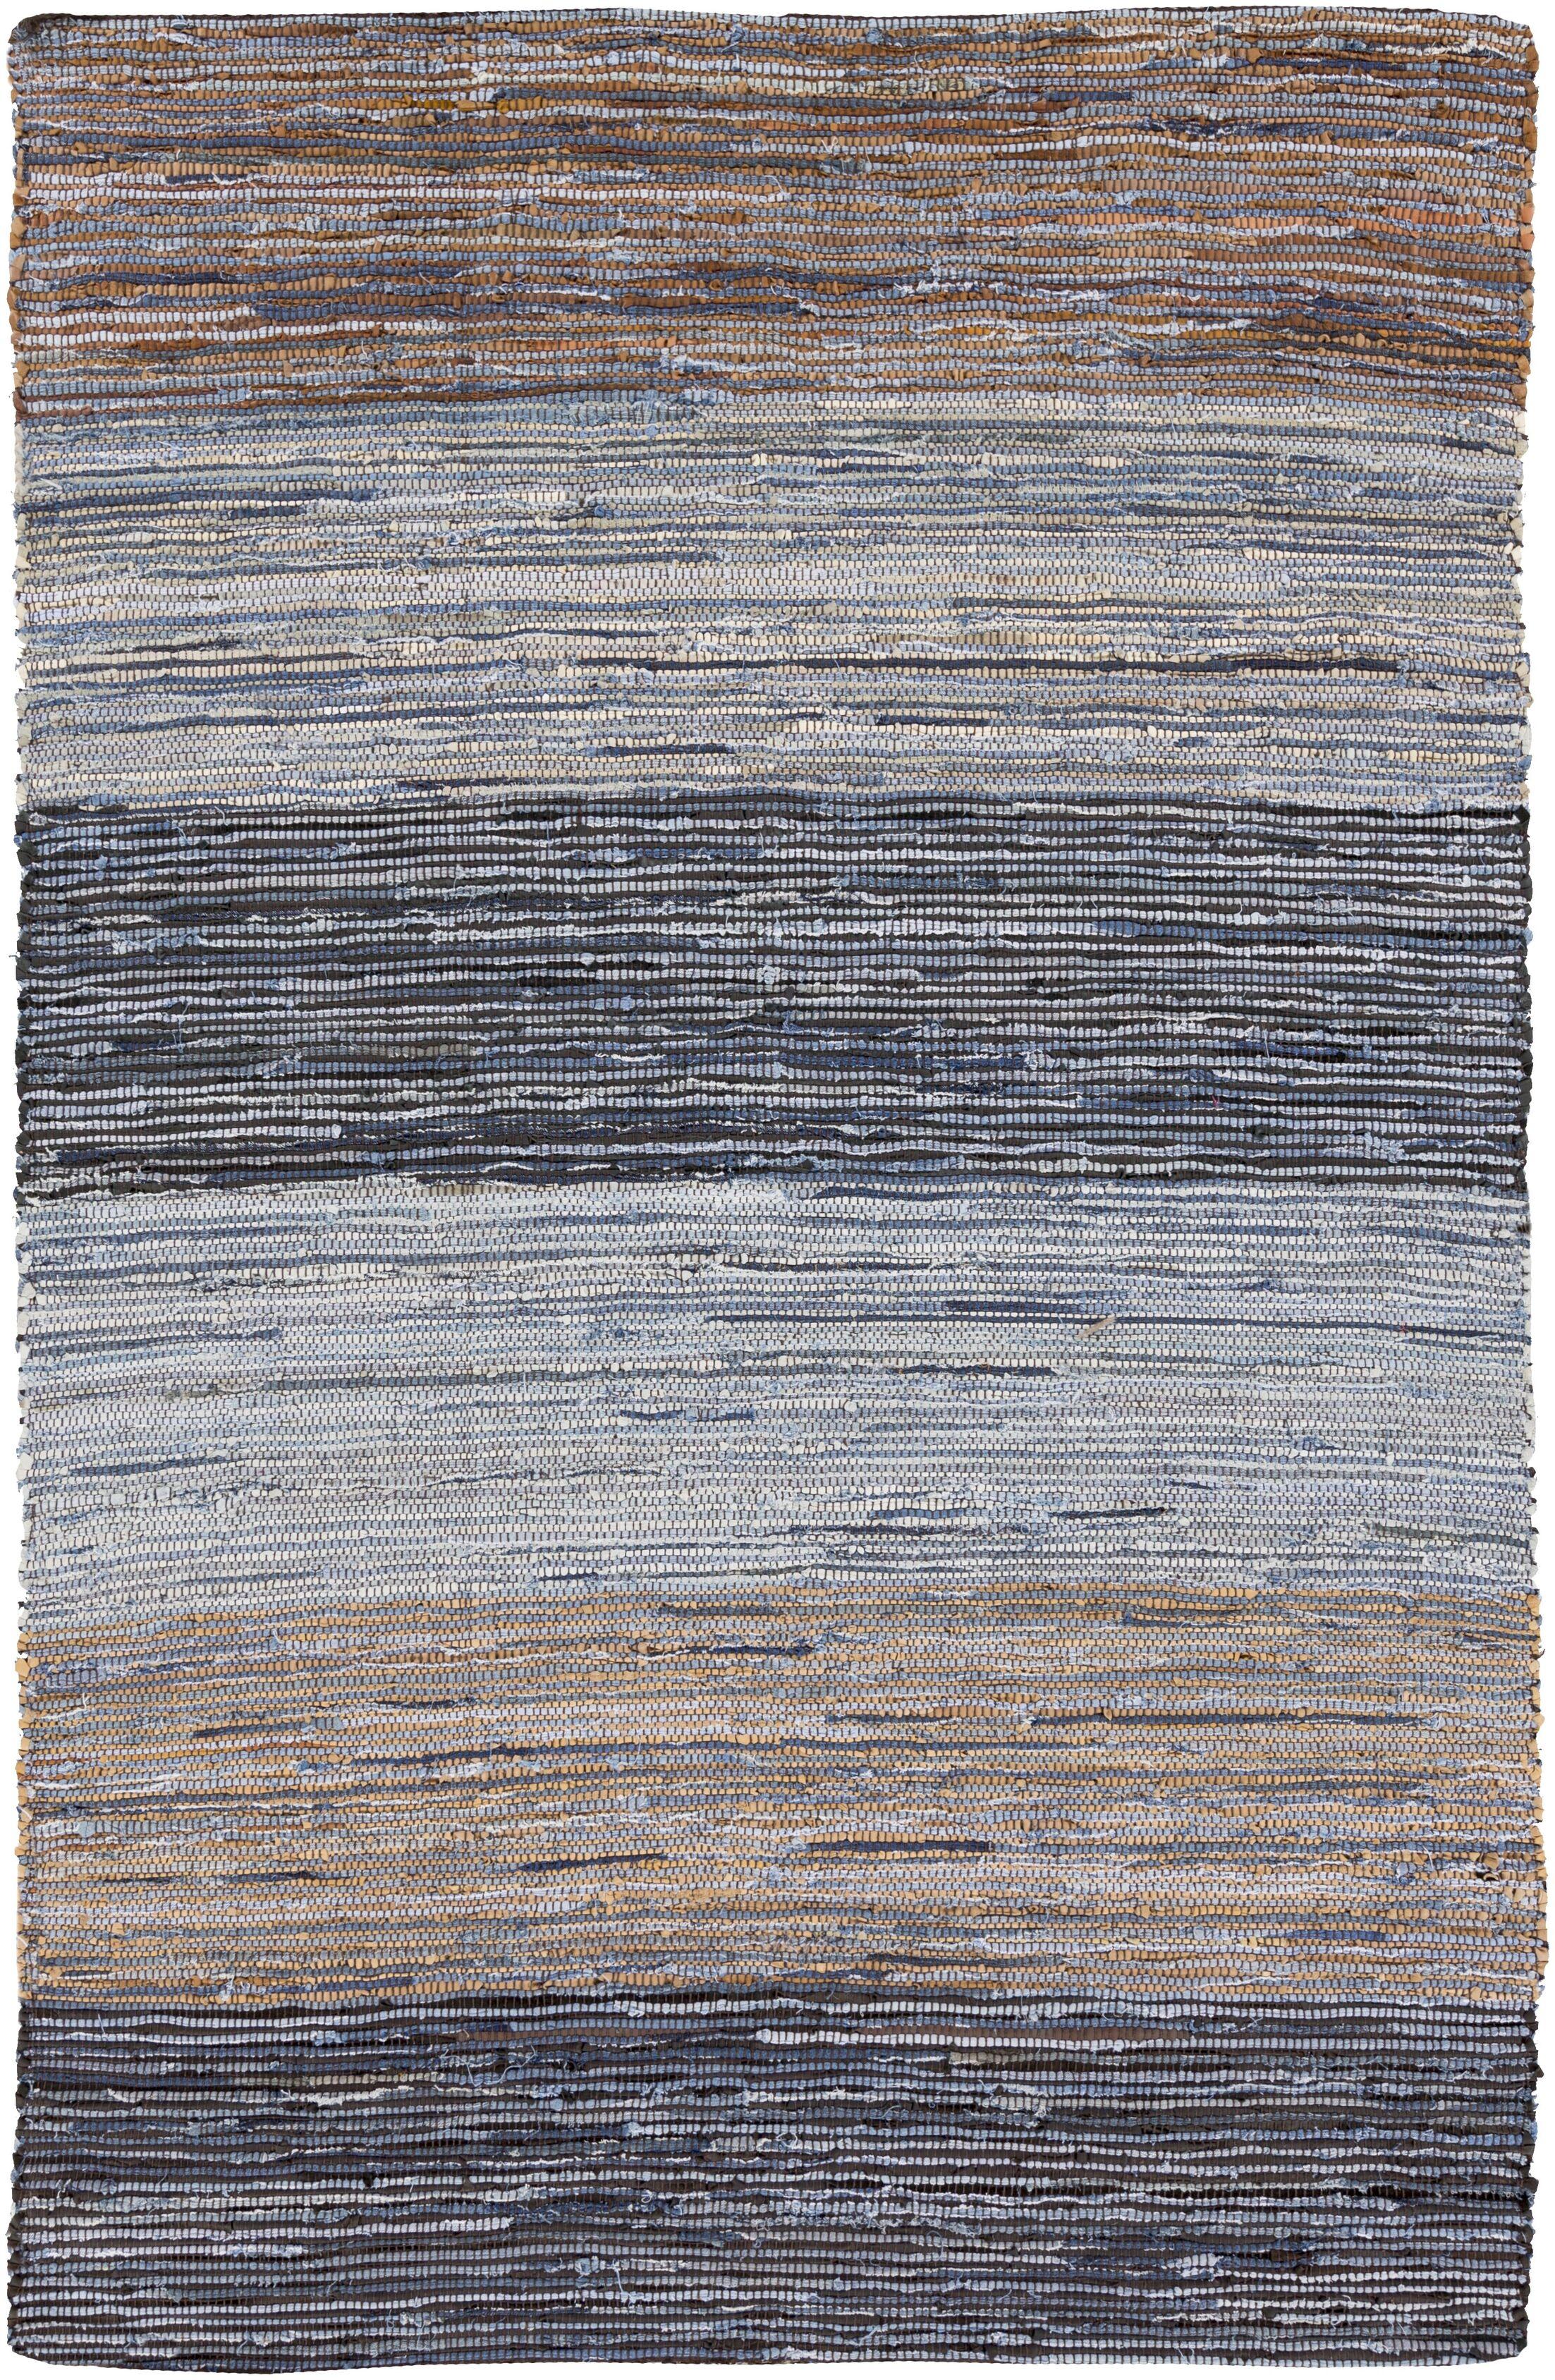 Audriana Hand-Woven Cotton Mocha/Slate Striped Area Rug Rug Size: Rectangle 8' x 11'